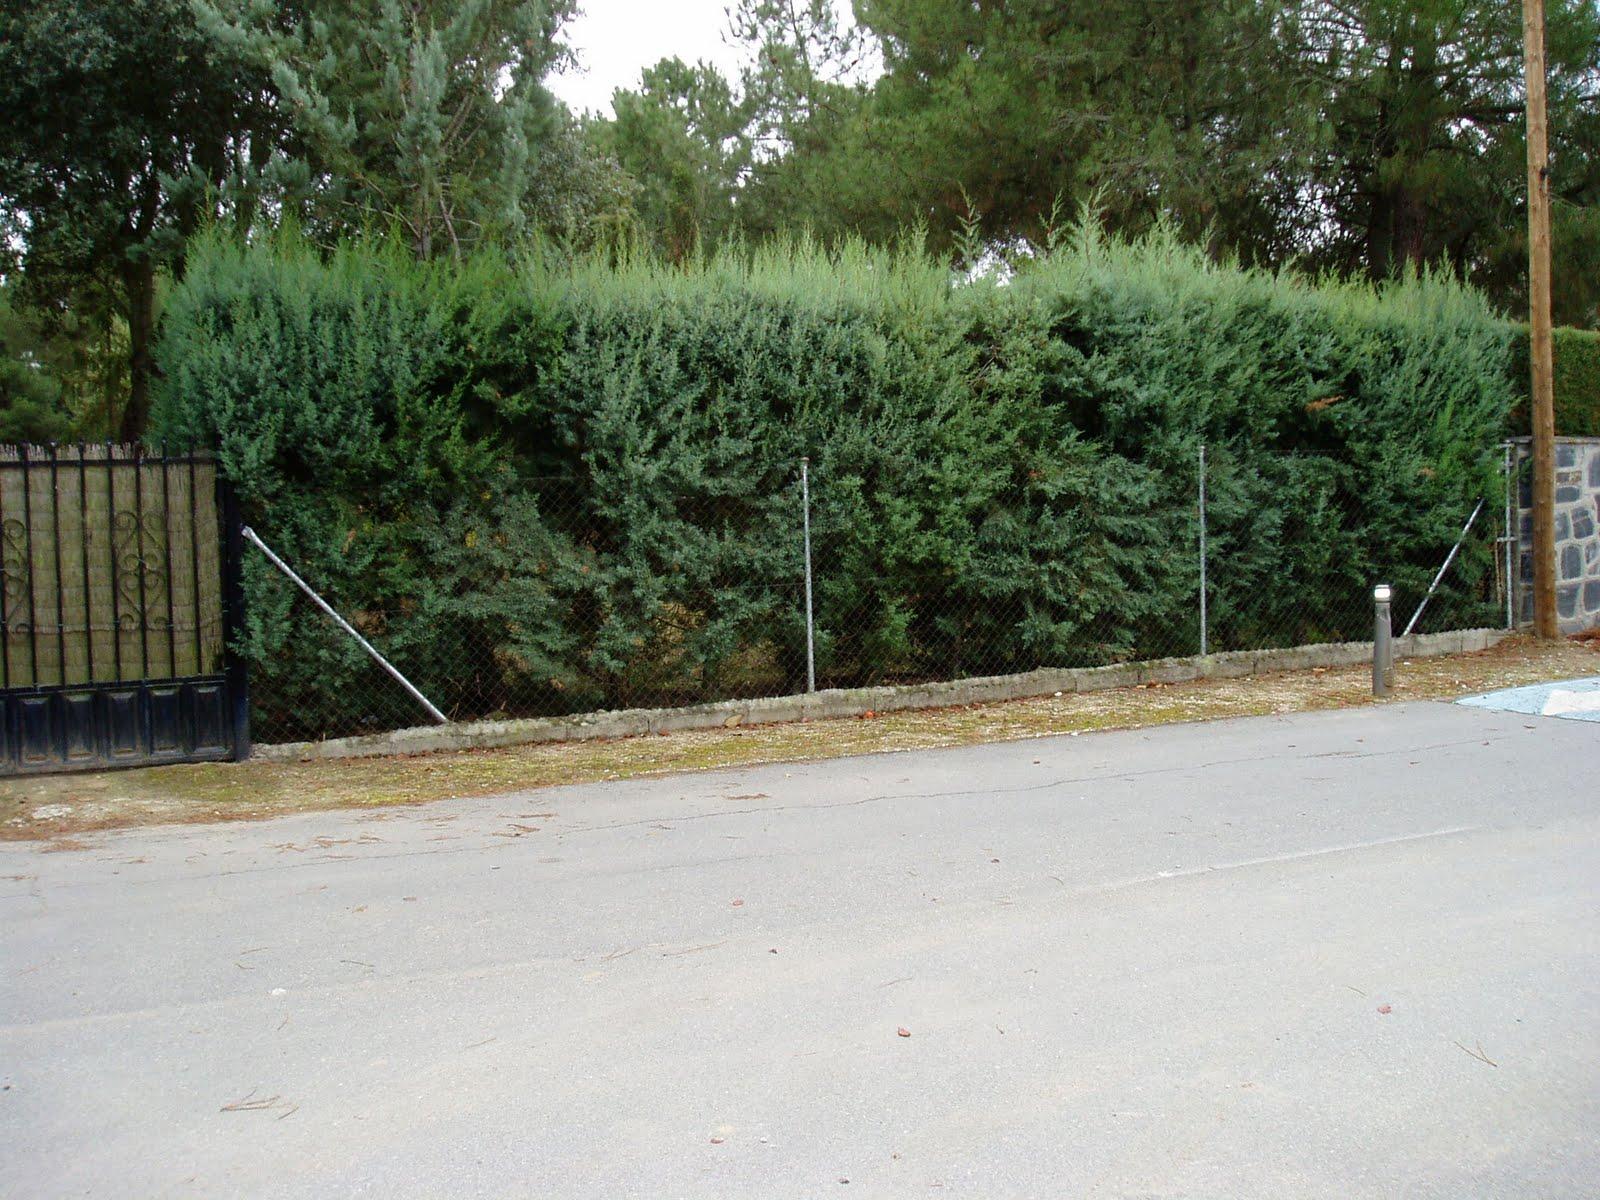 Poda de setos plantas riomoros - Setos de jardin ...